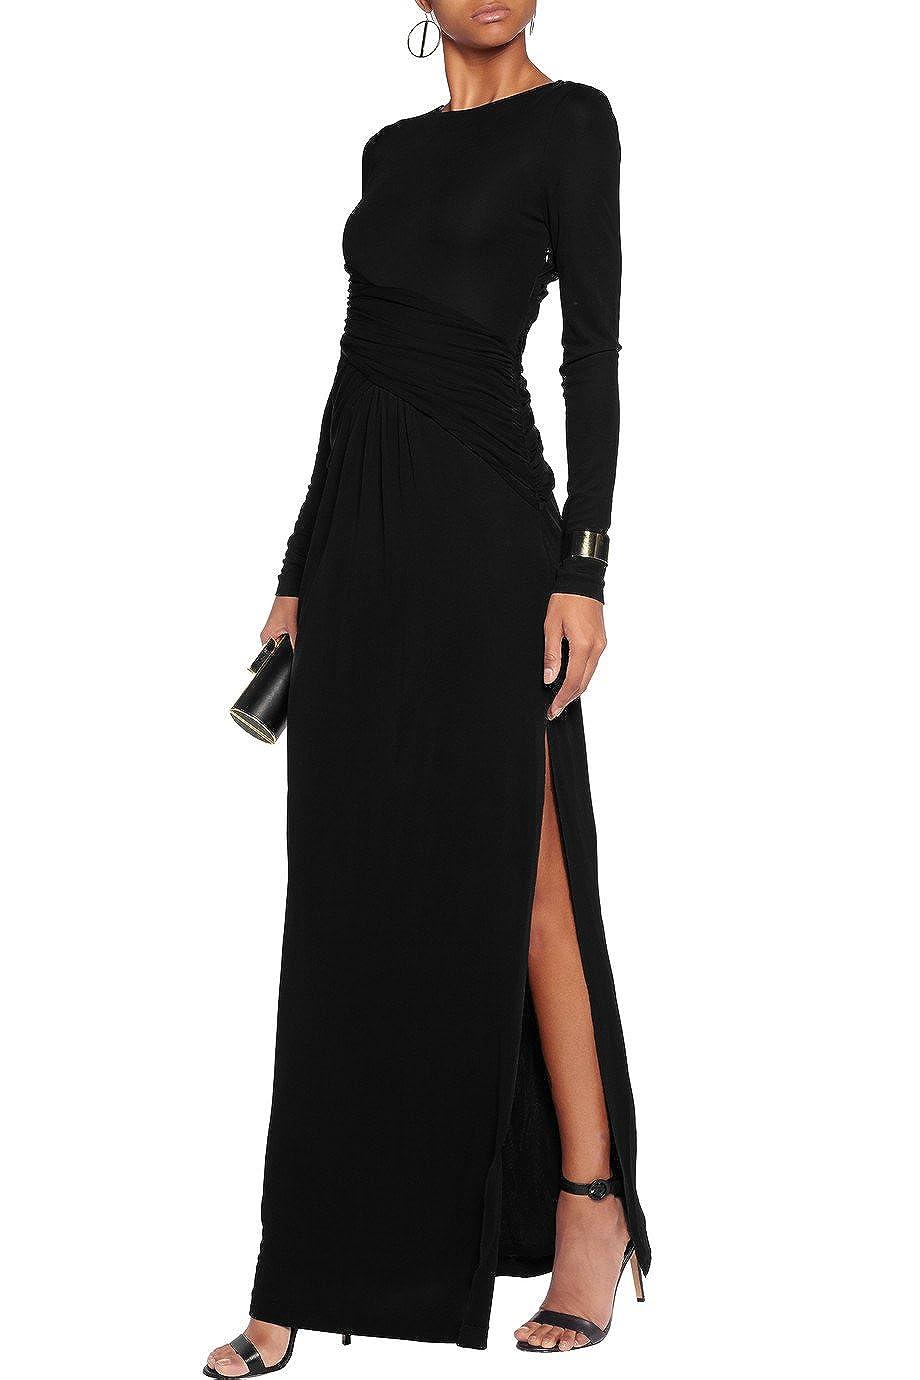 42a2f4d918 Amazon.com  Rachel Zoe Hopi Wrap-Effect Cutout Stretch-Jersey Maxi Dress  Black Size 2  Clothing